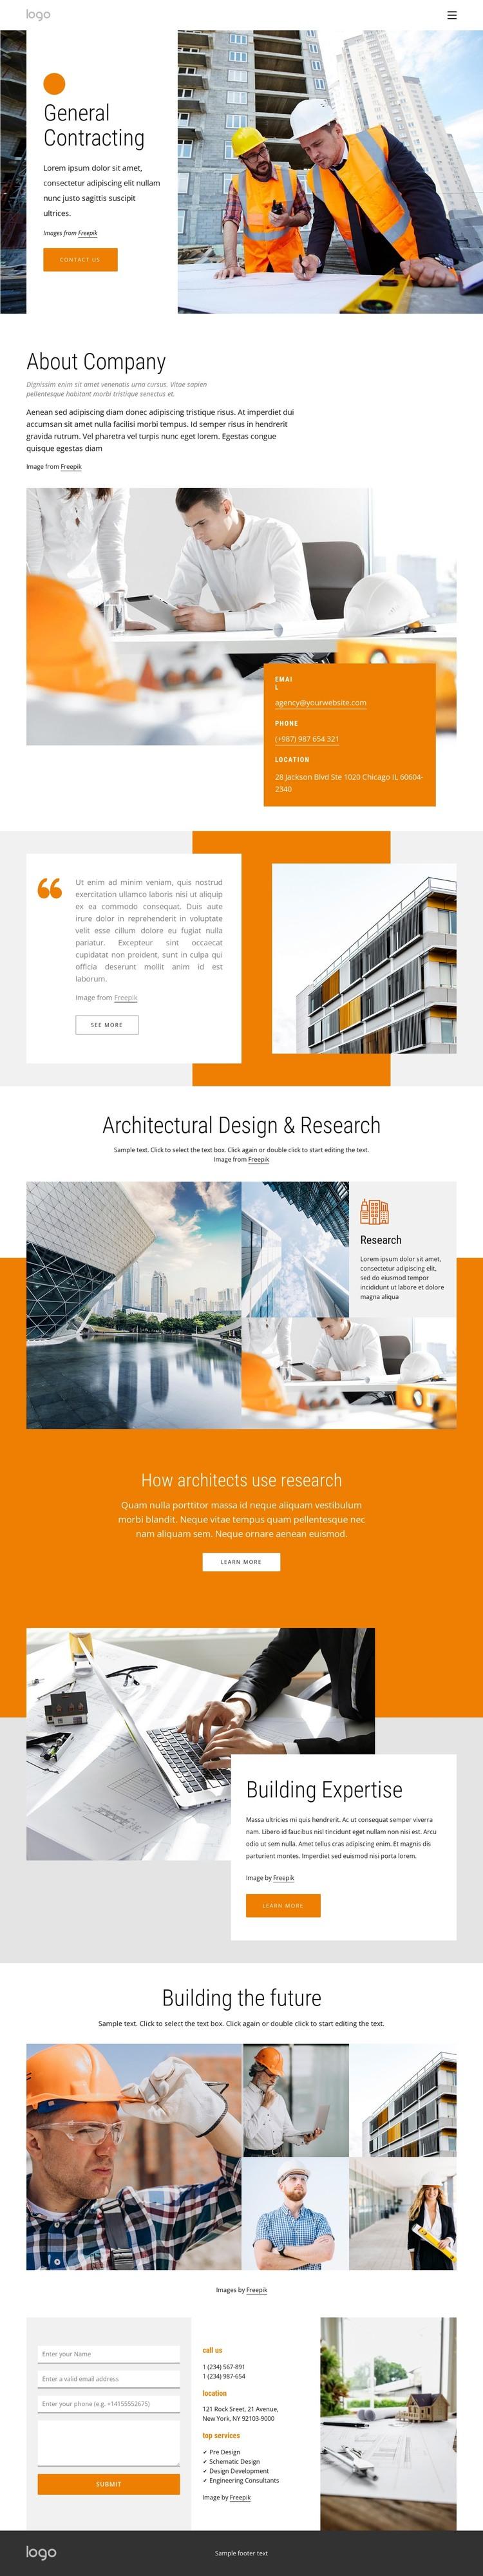 Full-service general contractor Web Design